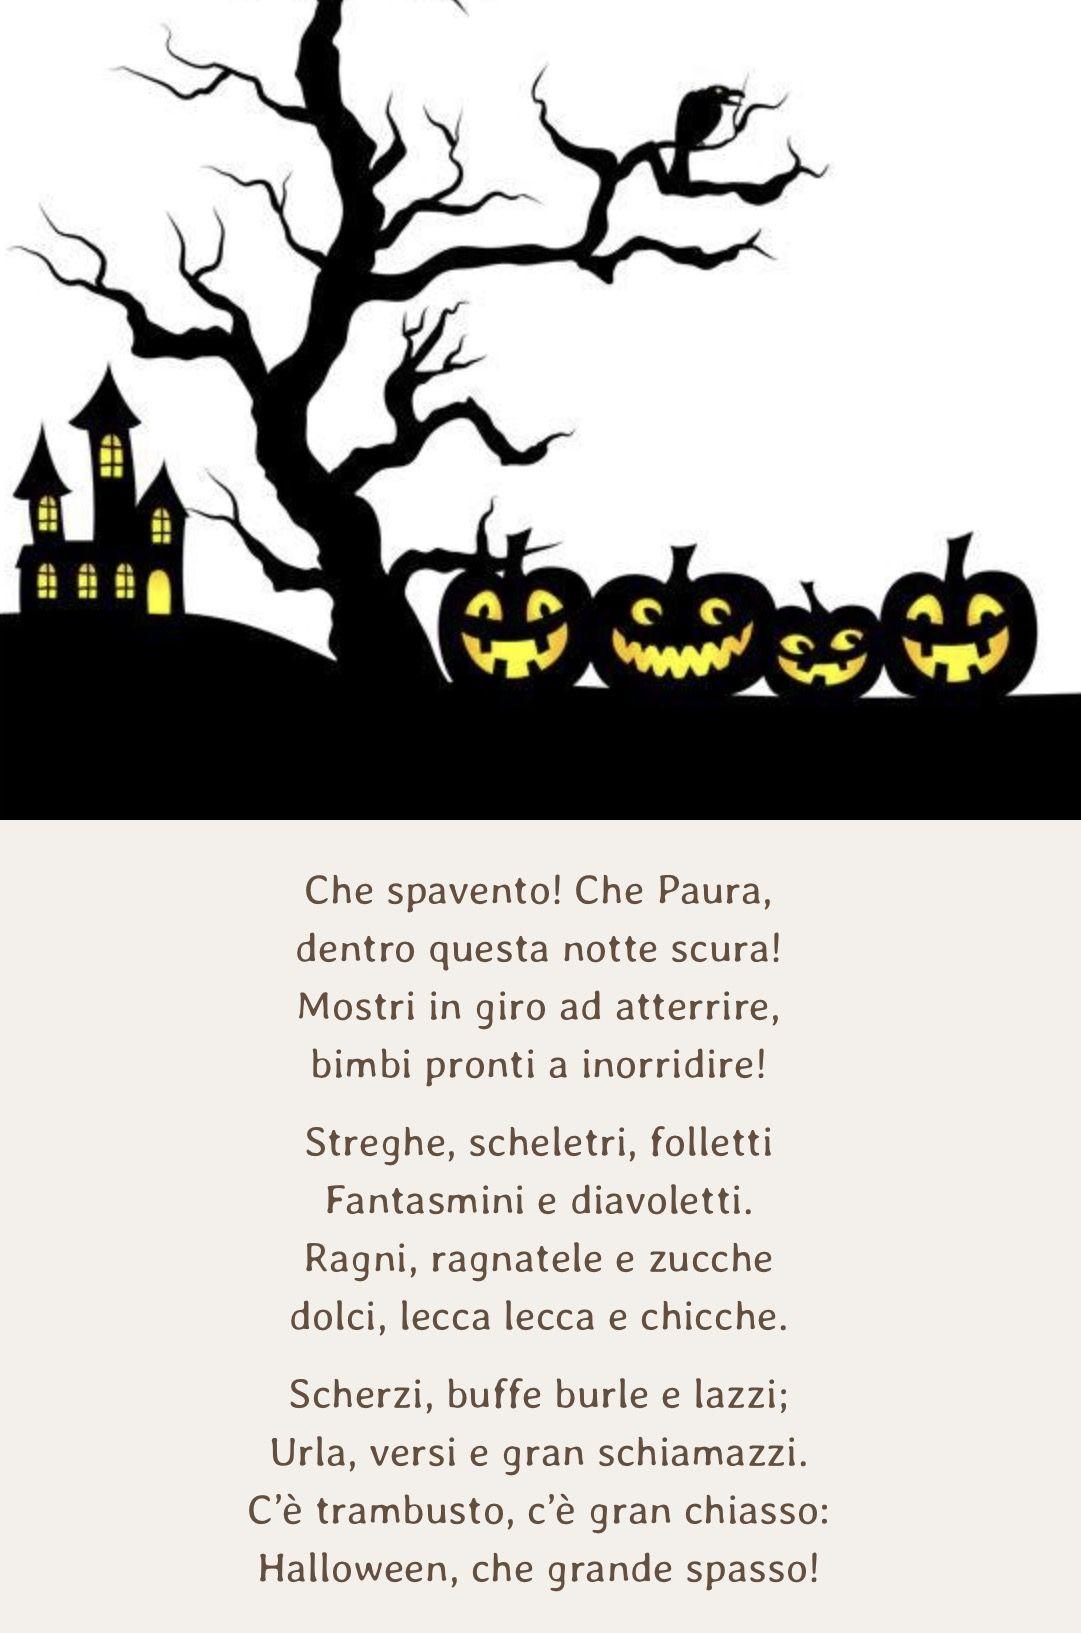 Halloween Decorations, Montessori, Amigurumi, Horror, Asia, Silhouette,  Bedrooms, Amigurumi Patterns, Rocky Horror